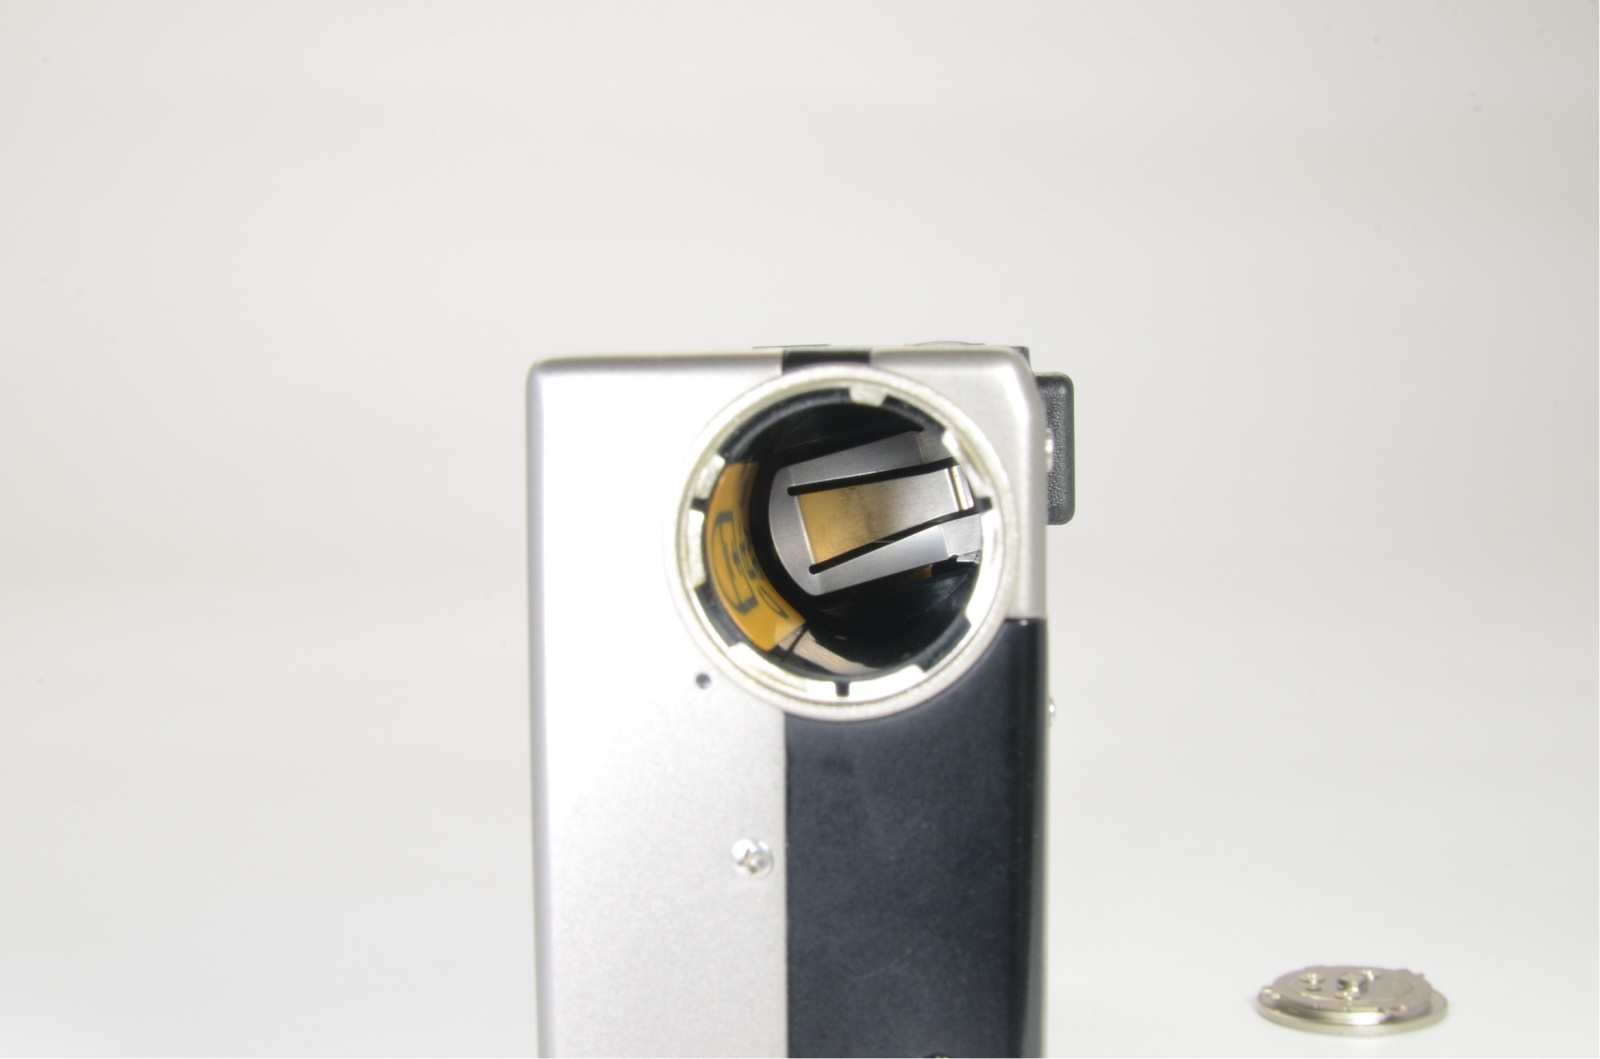 contax t3 titanium silver double teeth near mint shooting tested